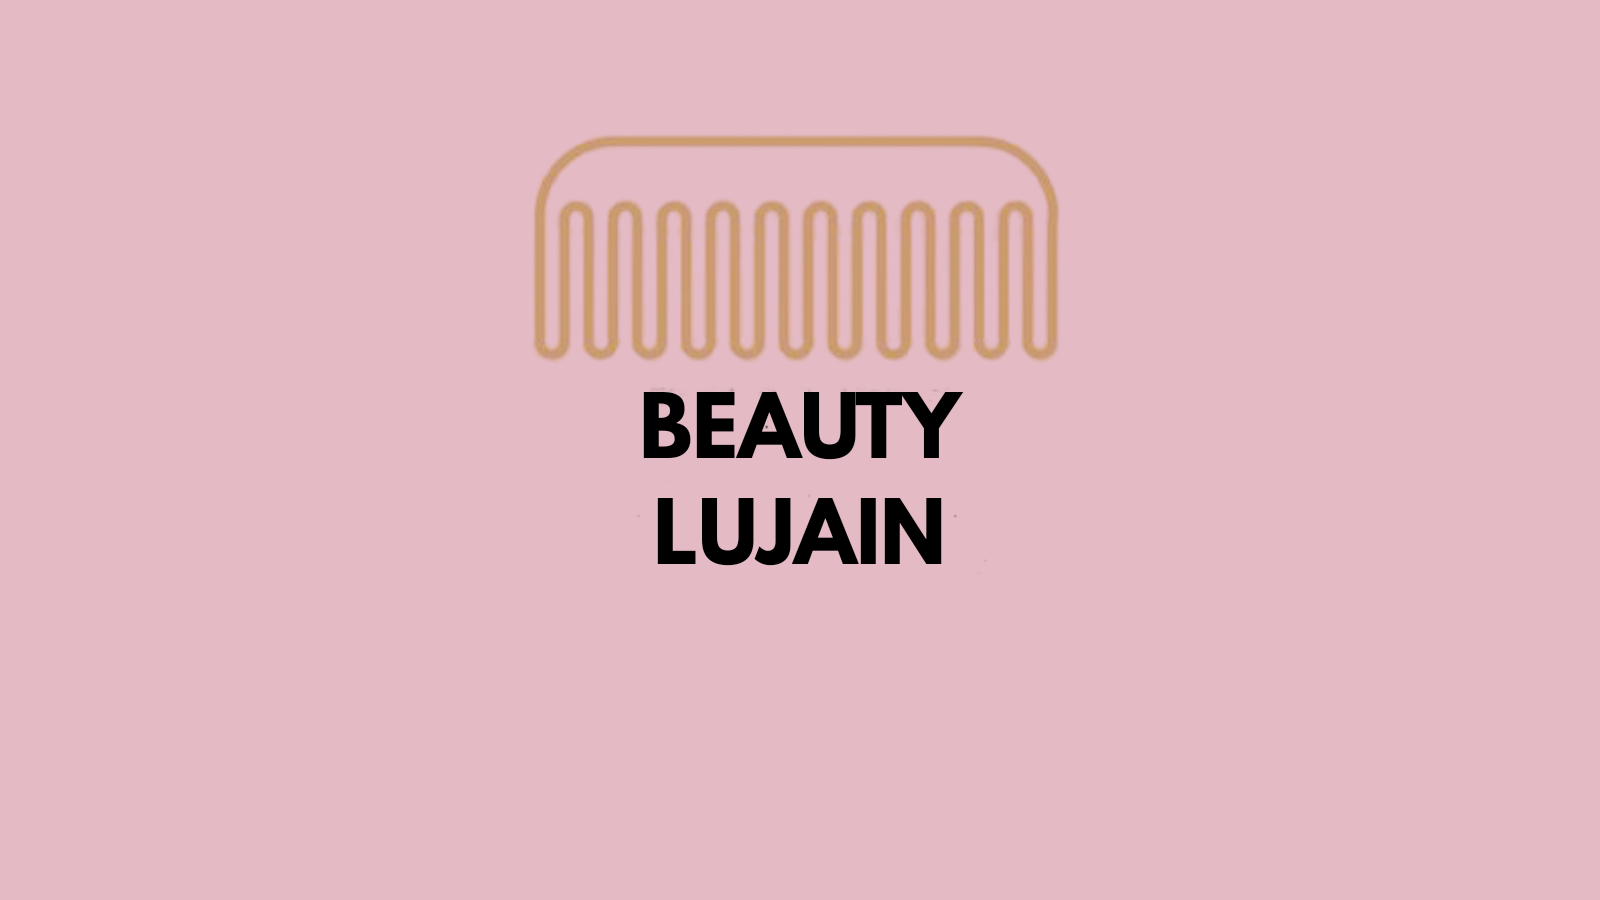 beauty lujain alan/m